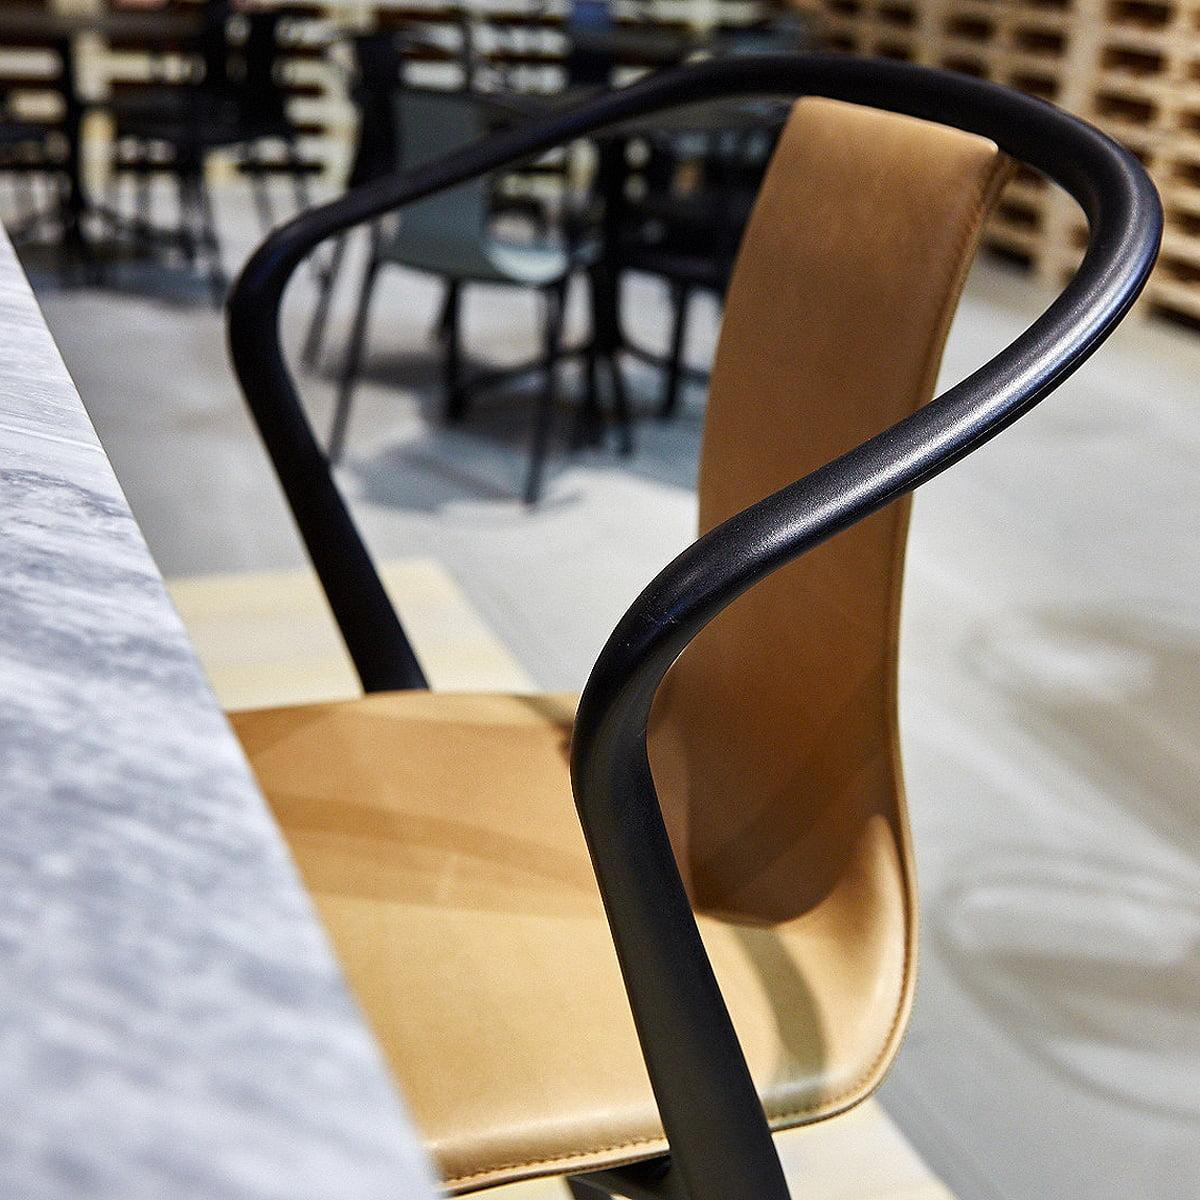 Vitra intense Bellevillenoir intense noir Chair Plastic cTK5Ful31J